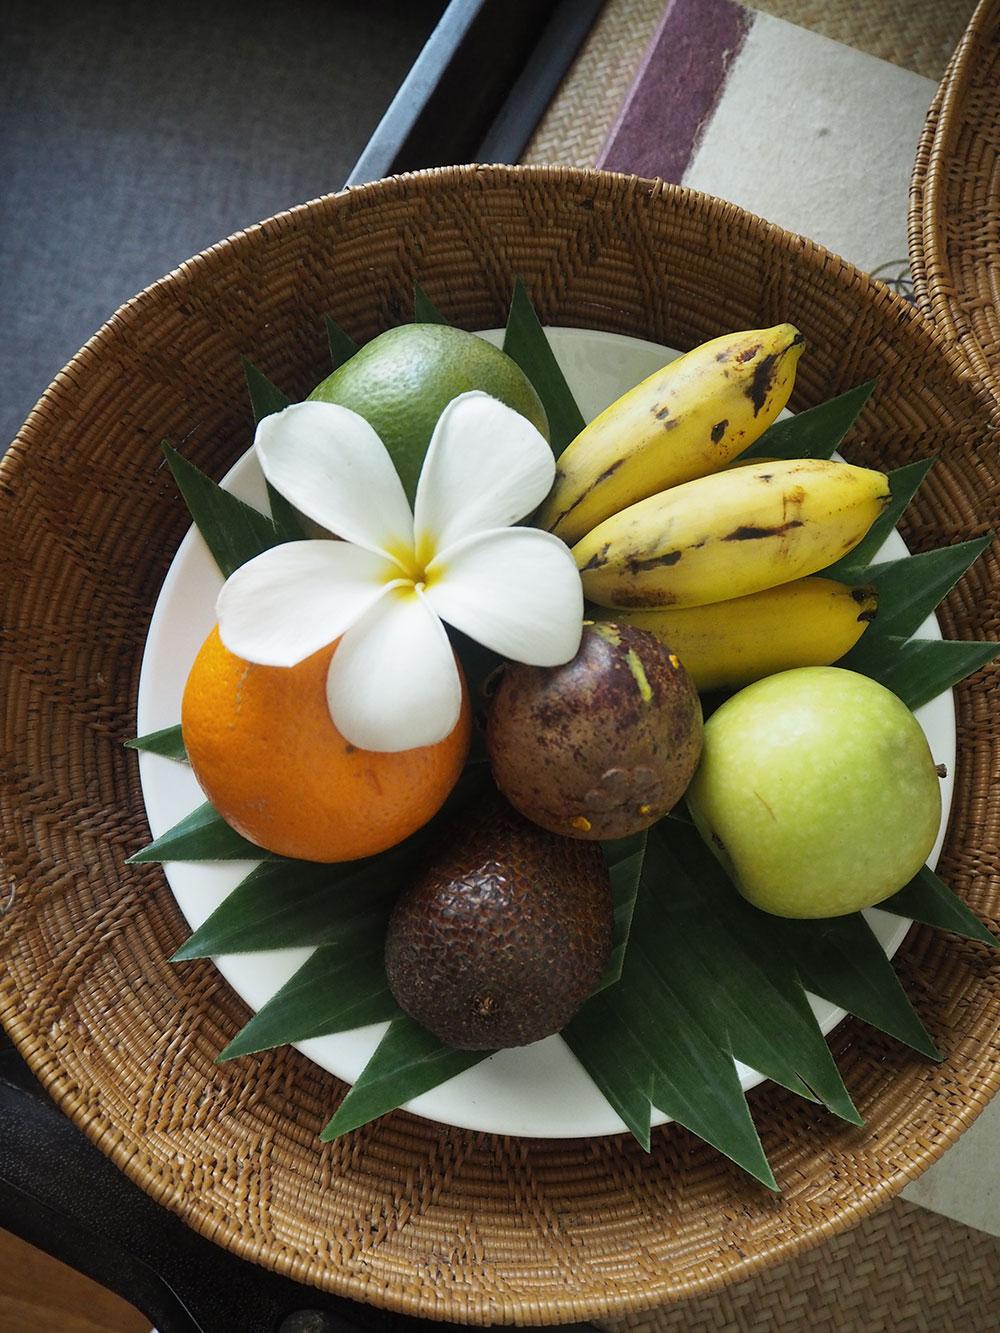 RosyCheeks-Bali-Fivelements-Fruit-Basket